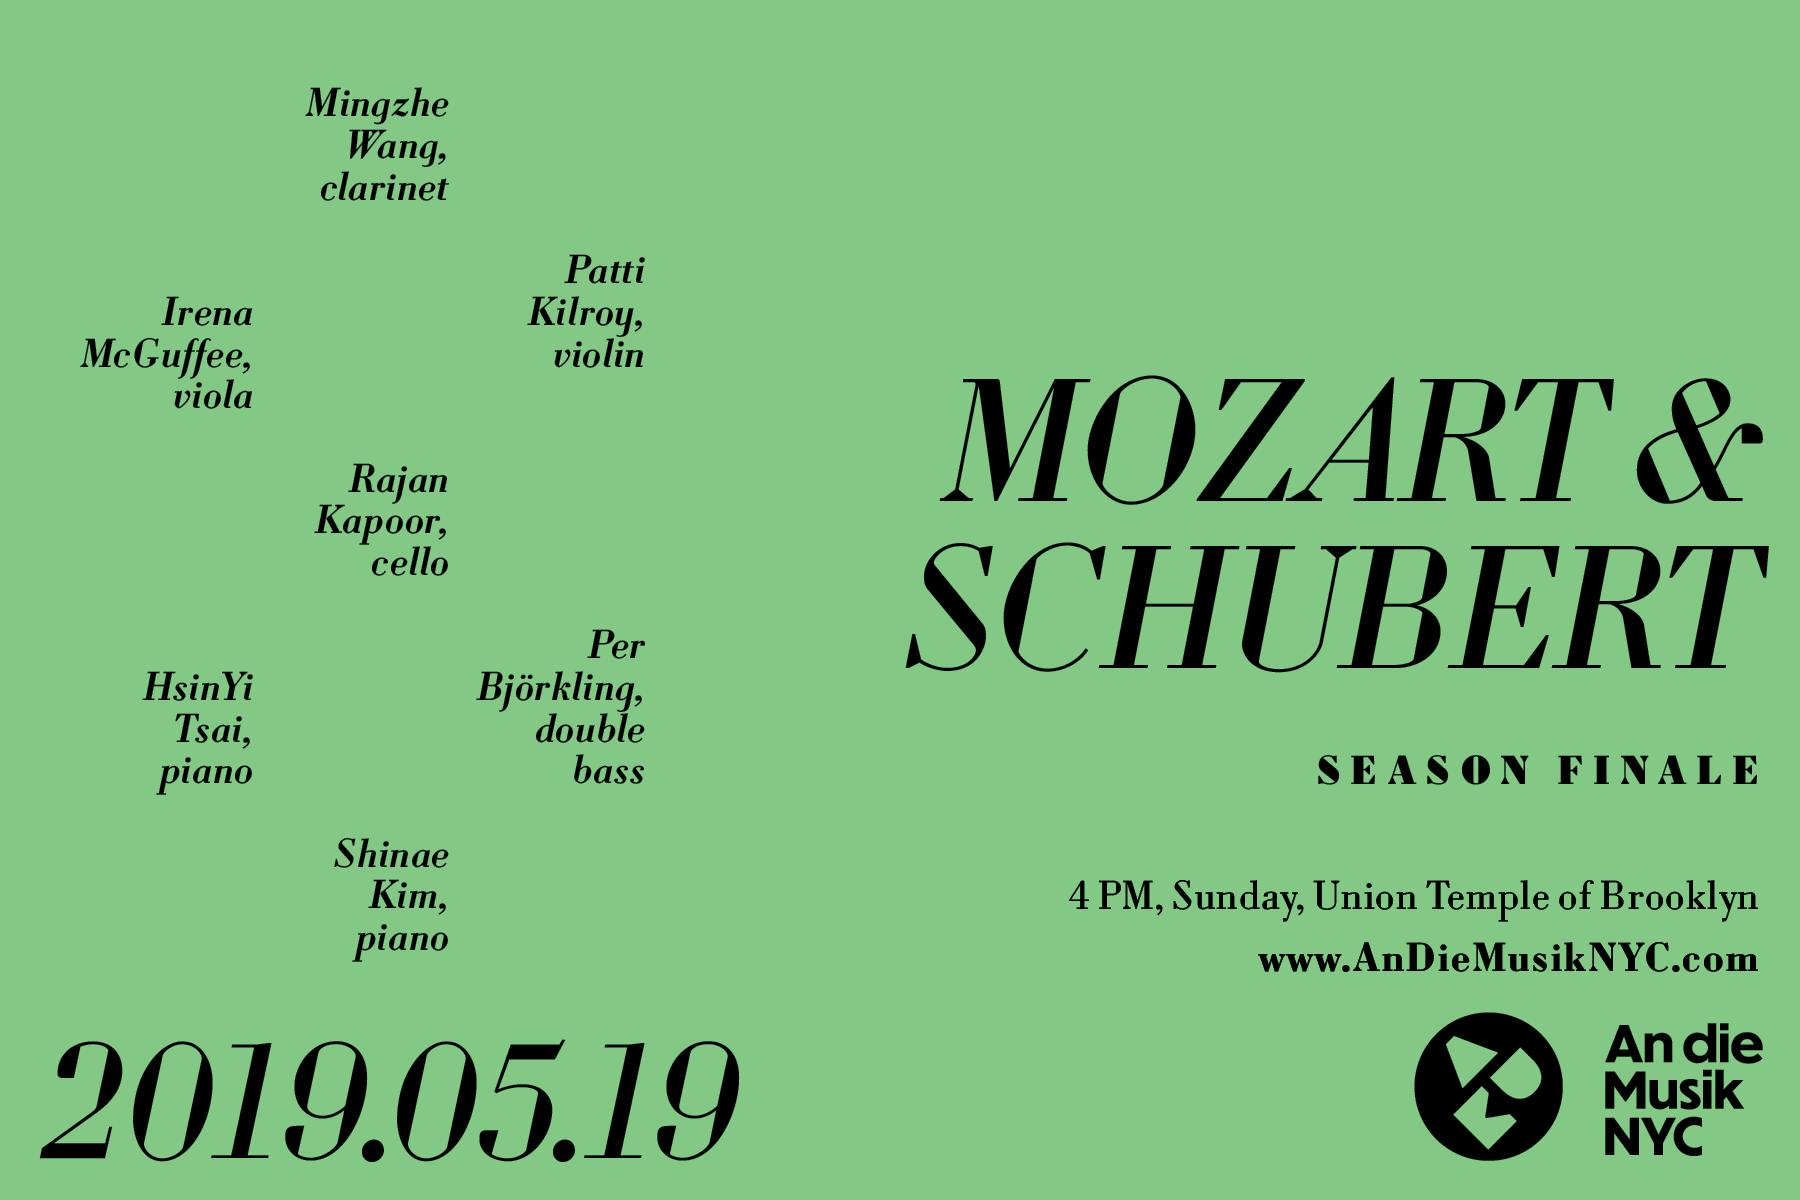 ADM Season Finale: Kegelstatt Trio and Trout Quintet